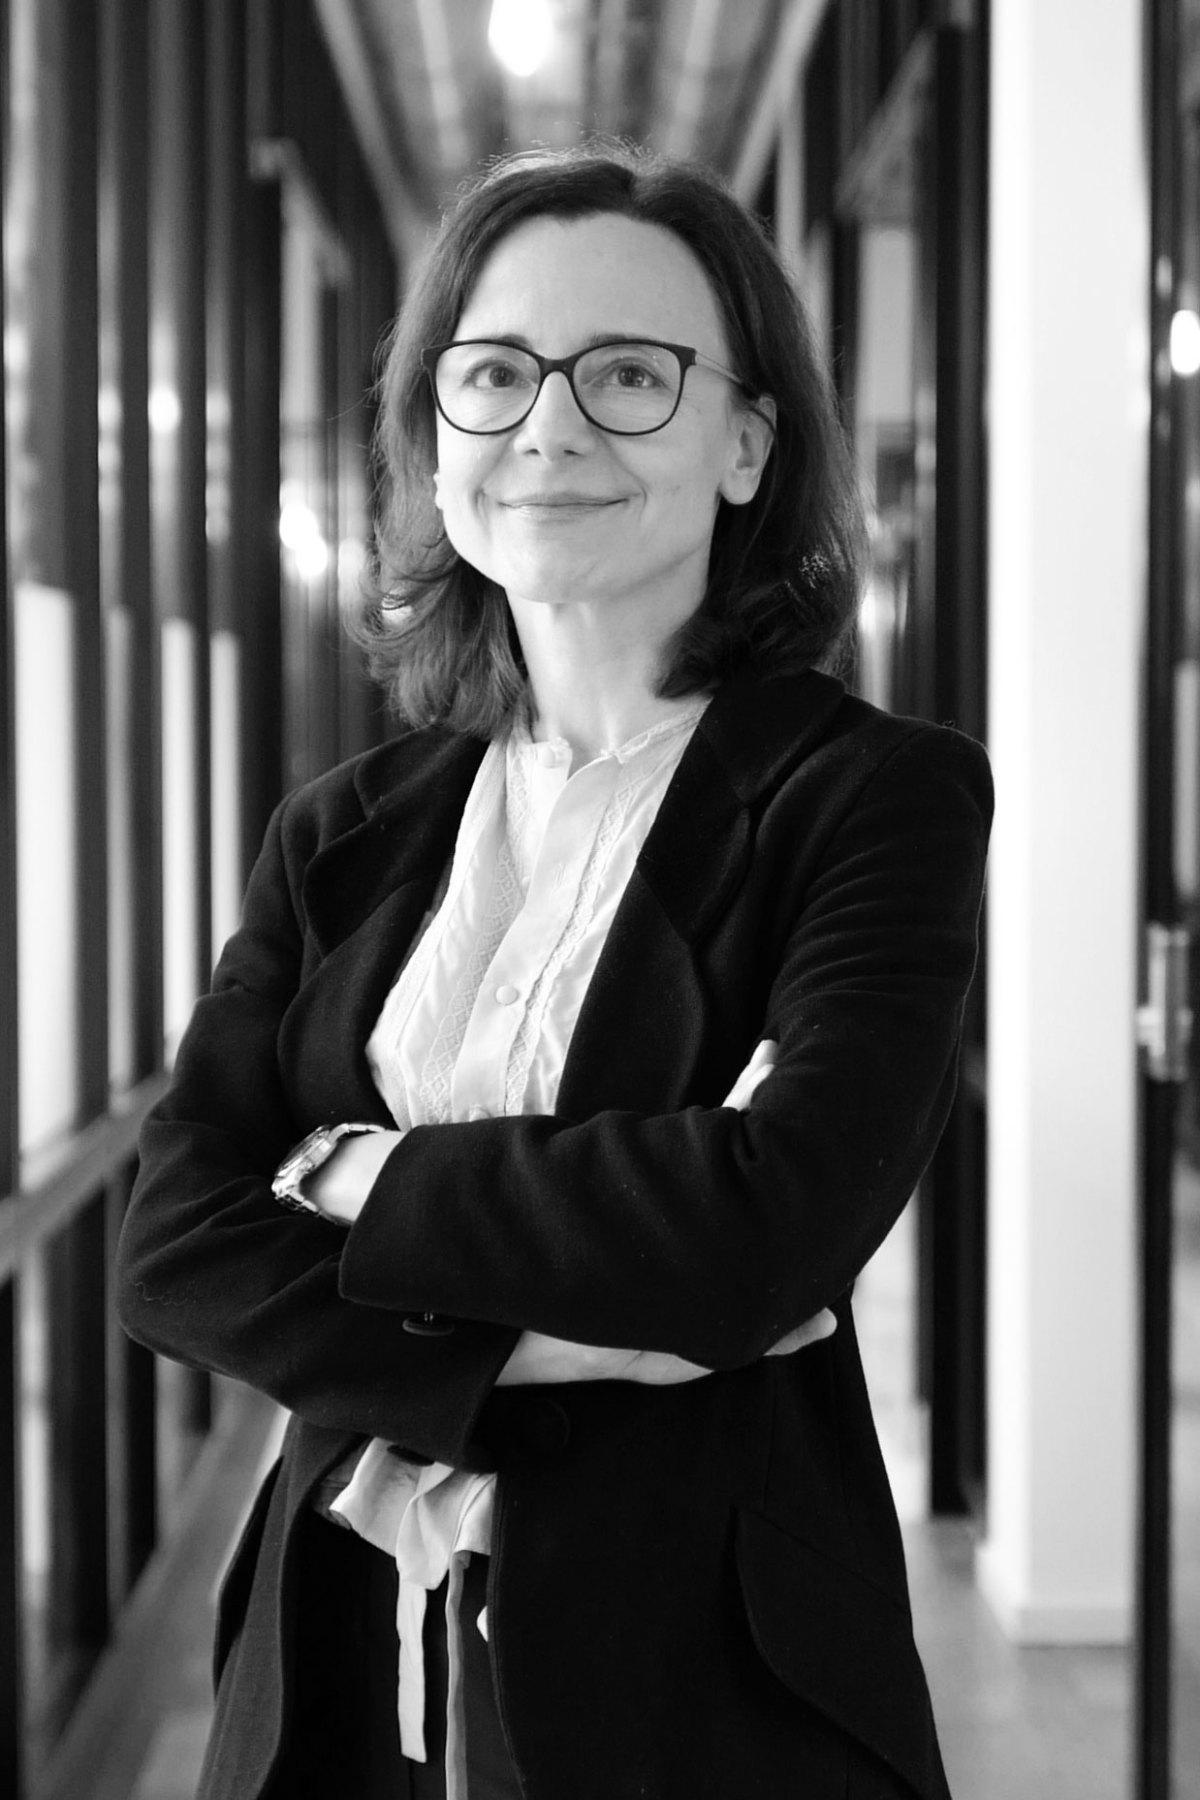 Yvonne Vetsopoulos